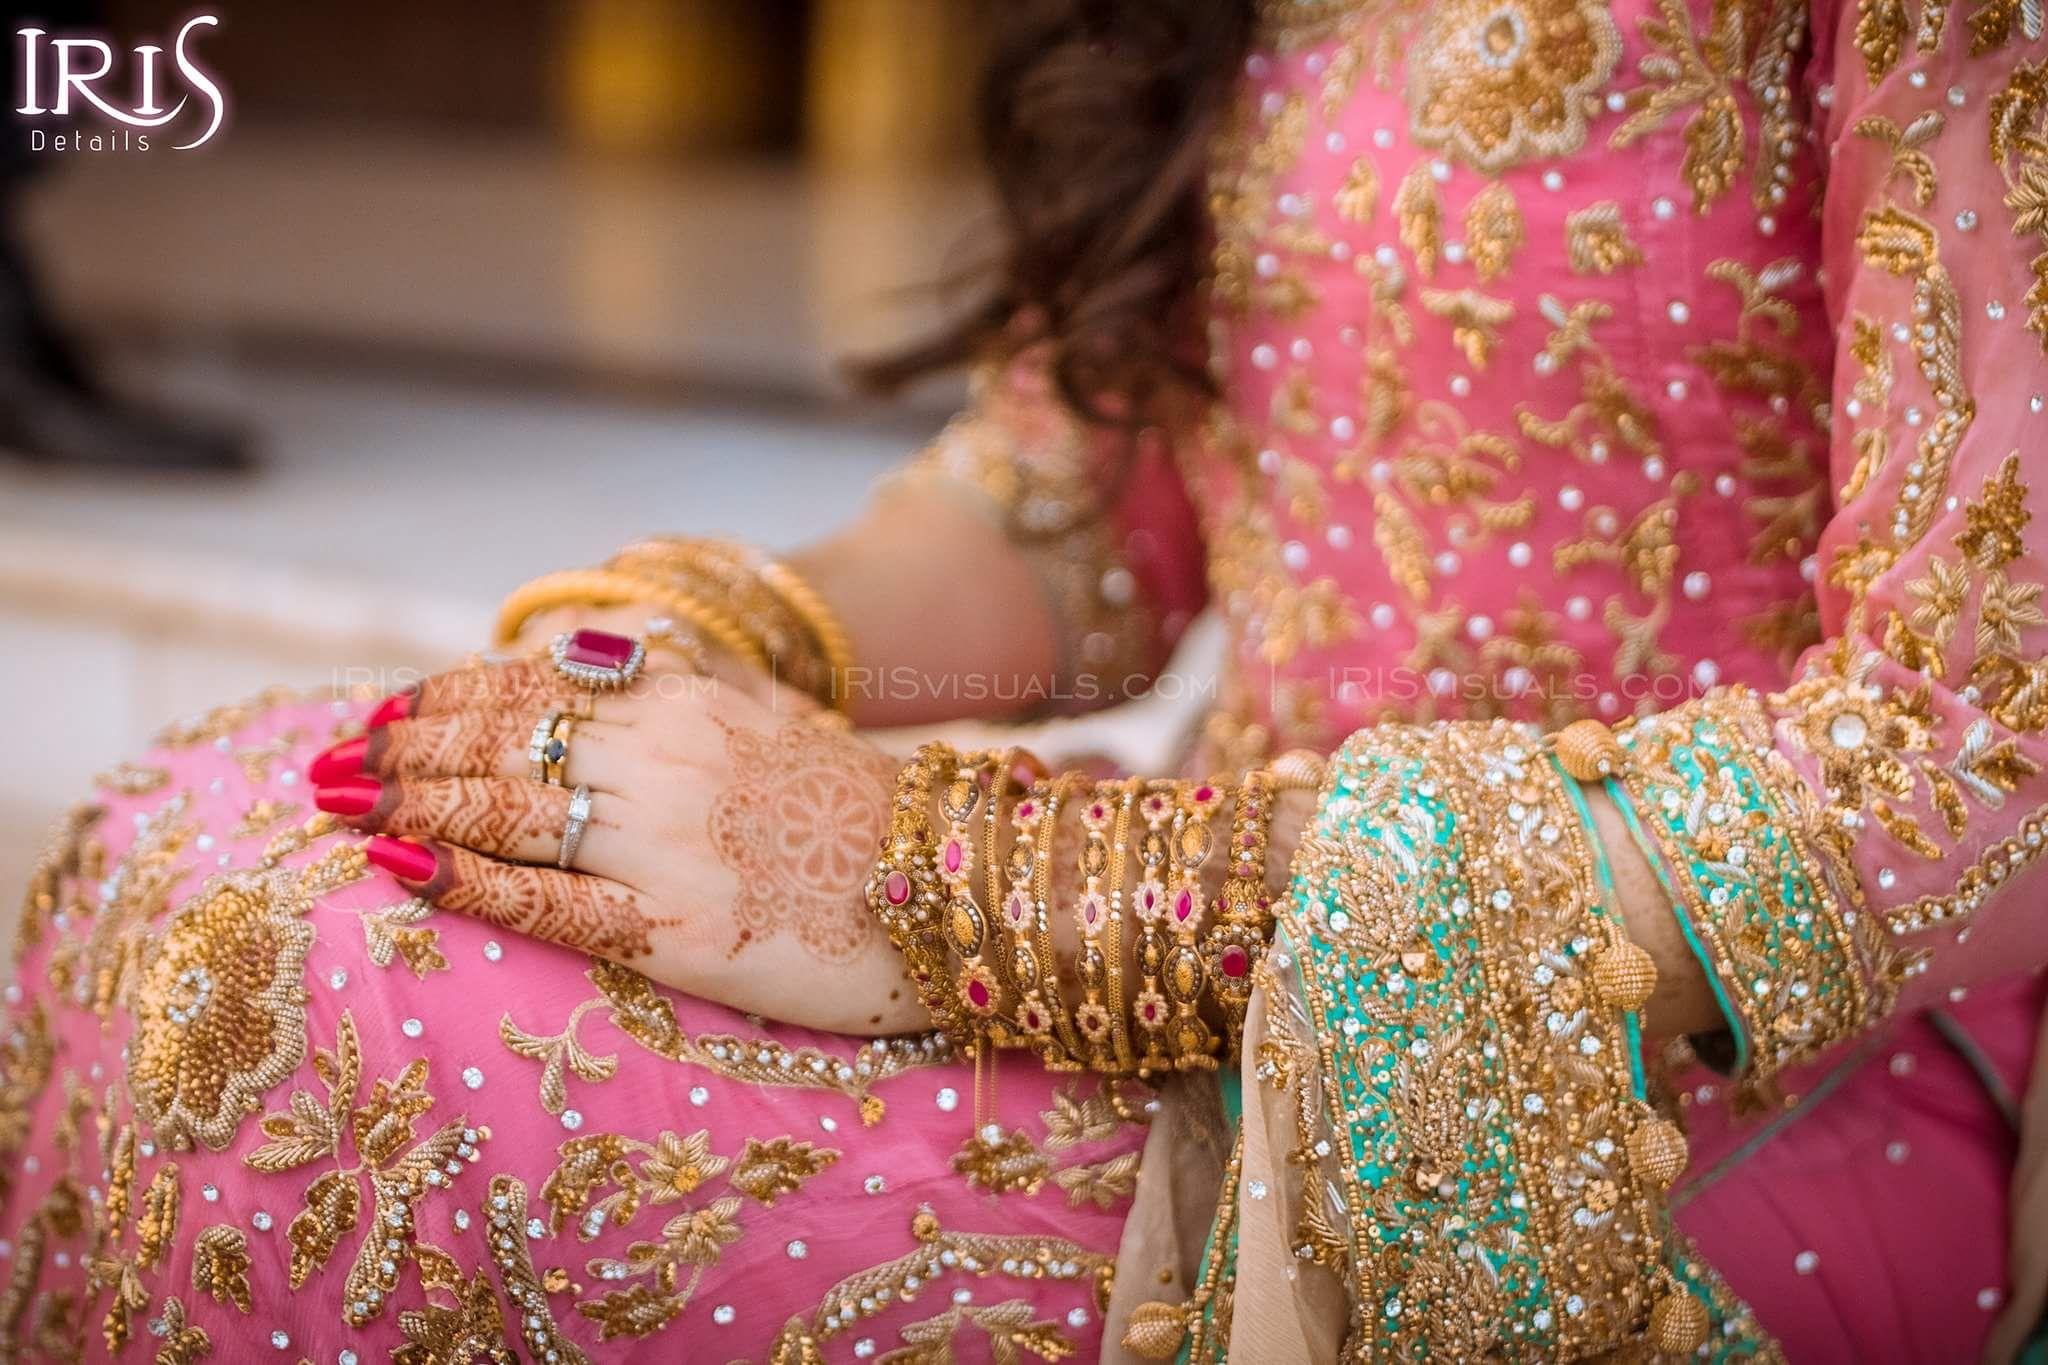 Iris photography Beautiful Bridal hands Pinterest